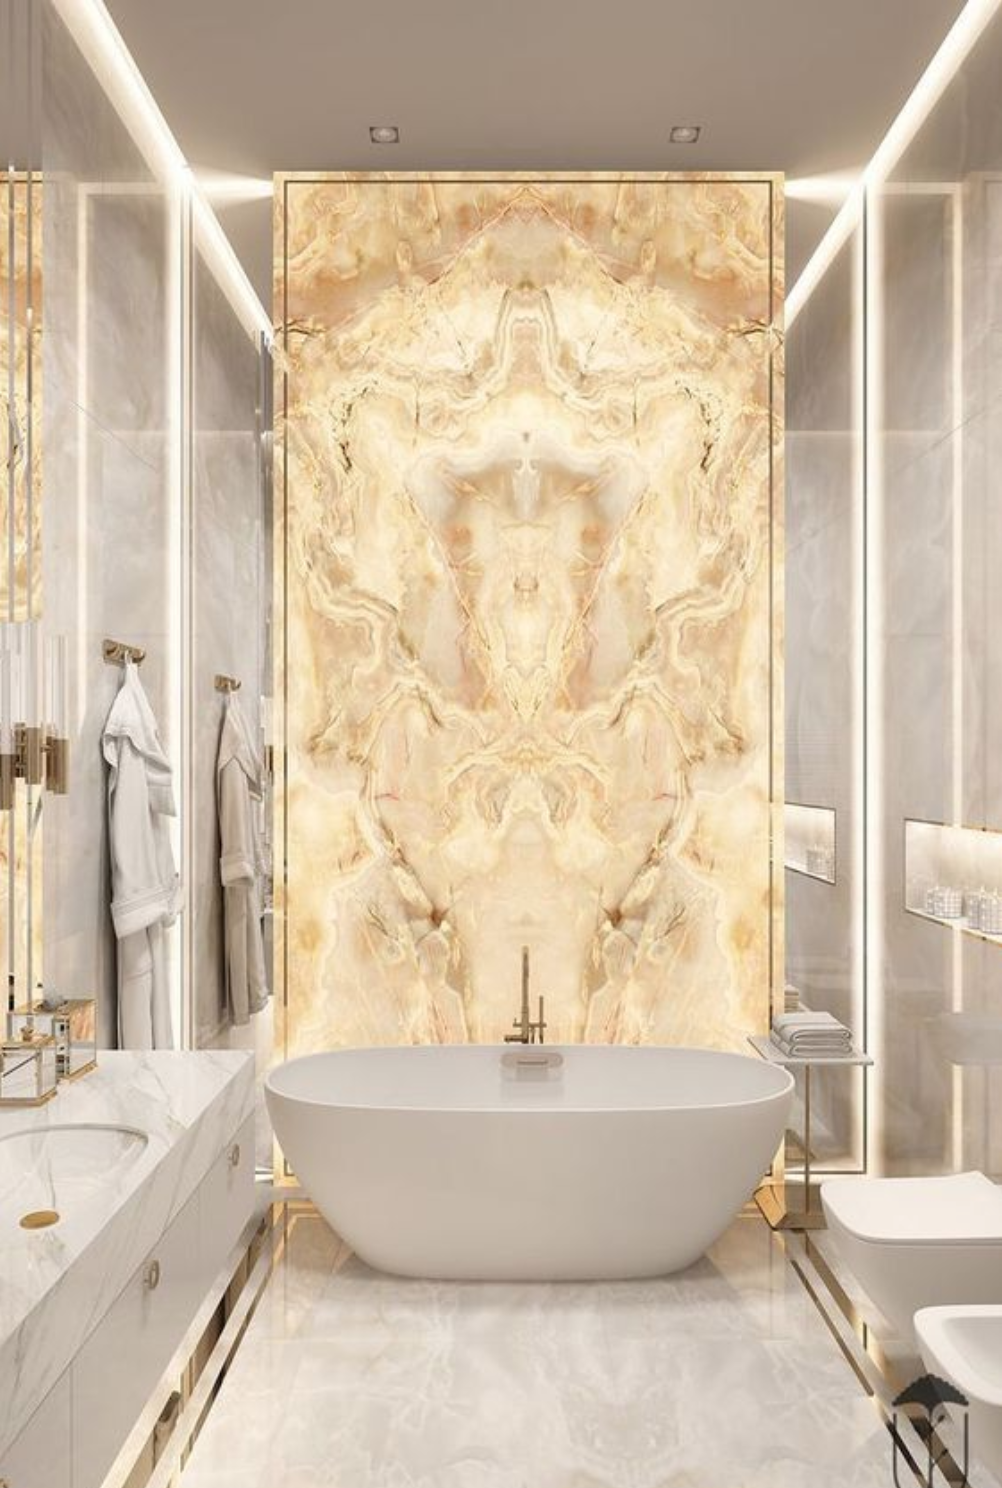 Onyx Bathroom Accent